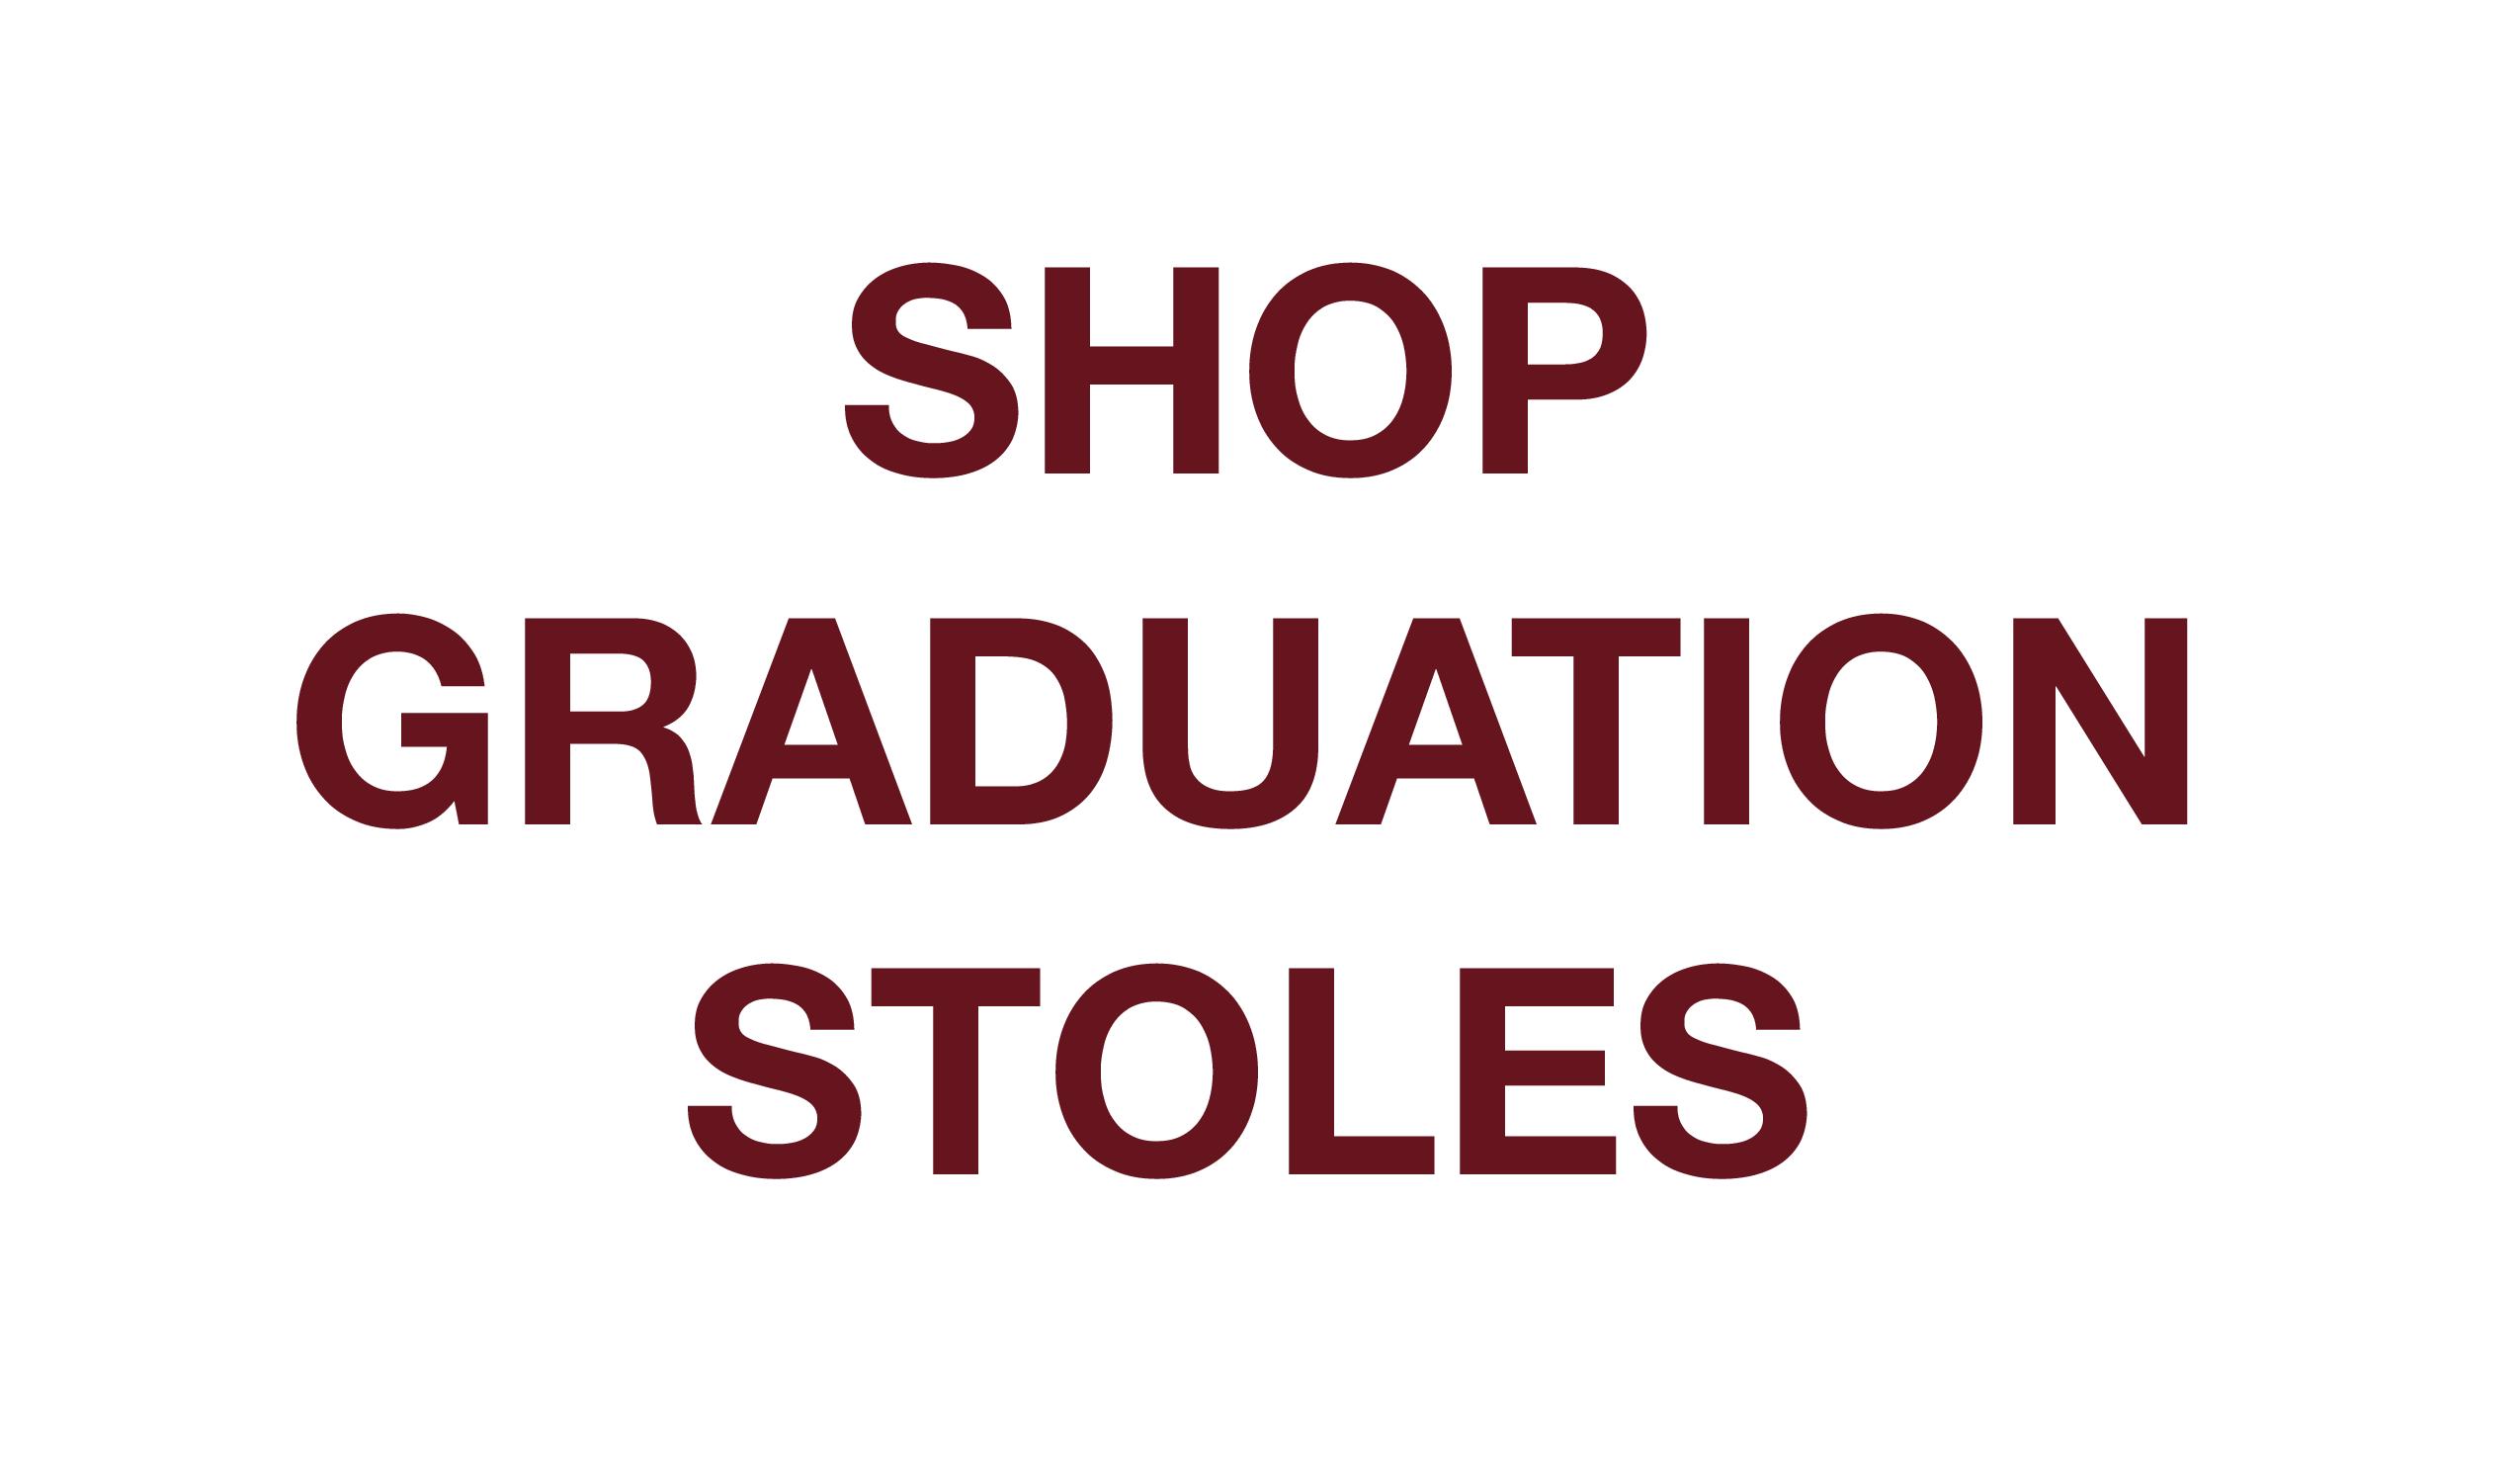 Customize Graduation Stoles, Greek Life Graduation Stoles, Graduation Sashes, Customize Texas State Graduation Stole